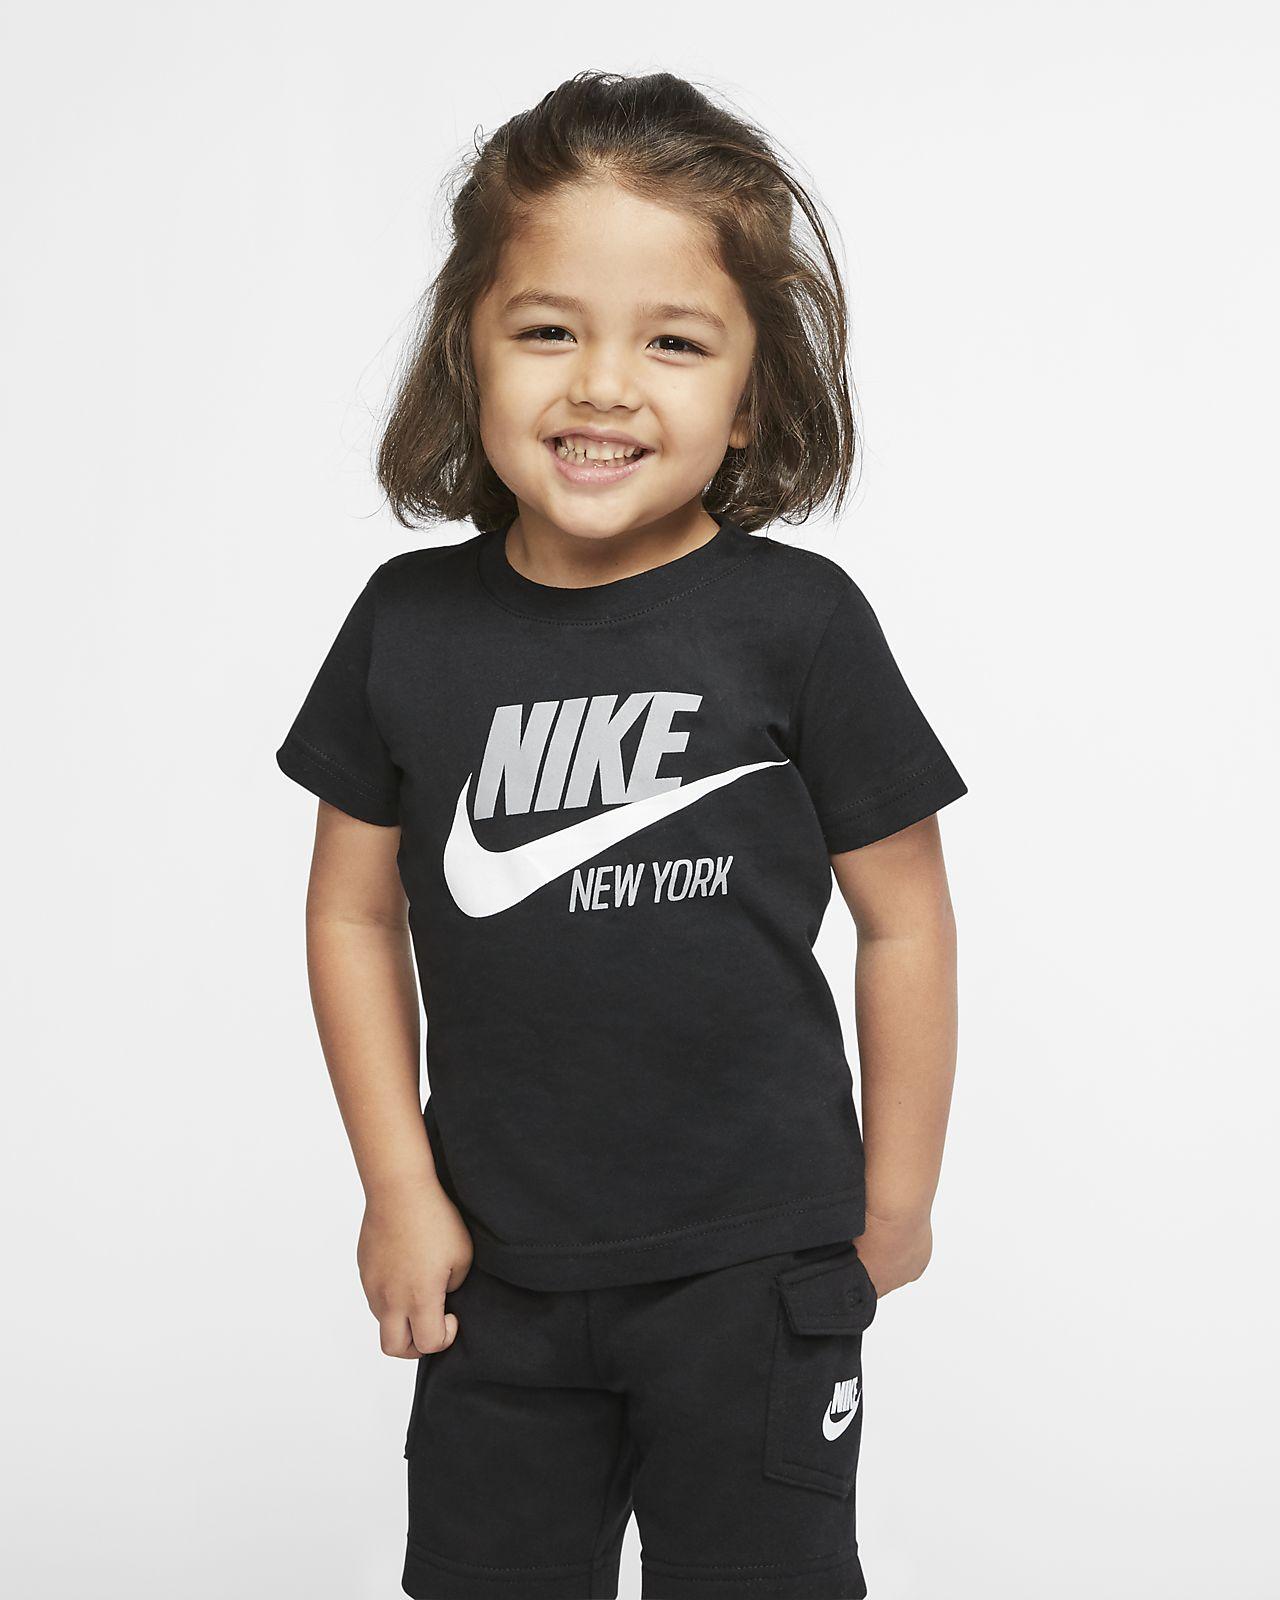 Nike Sportswear New York Toddler Short-Sleeve T-Shirt